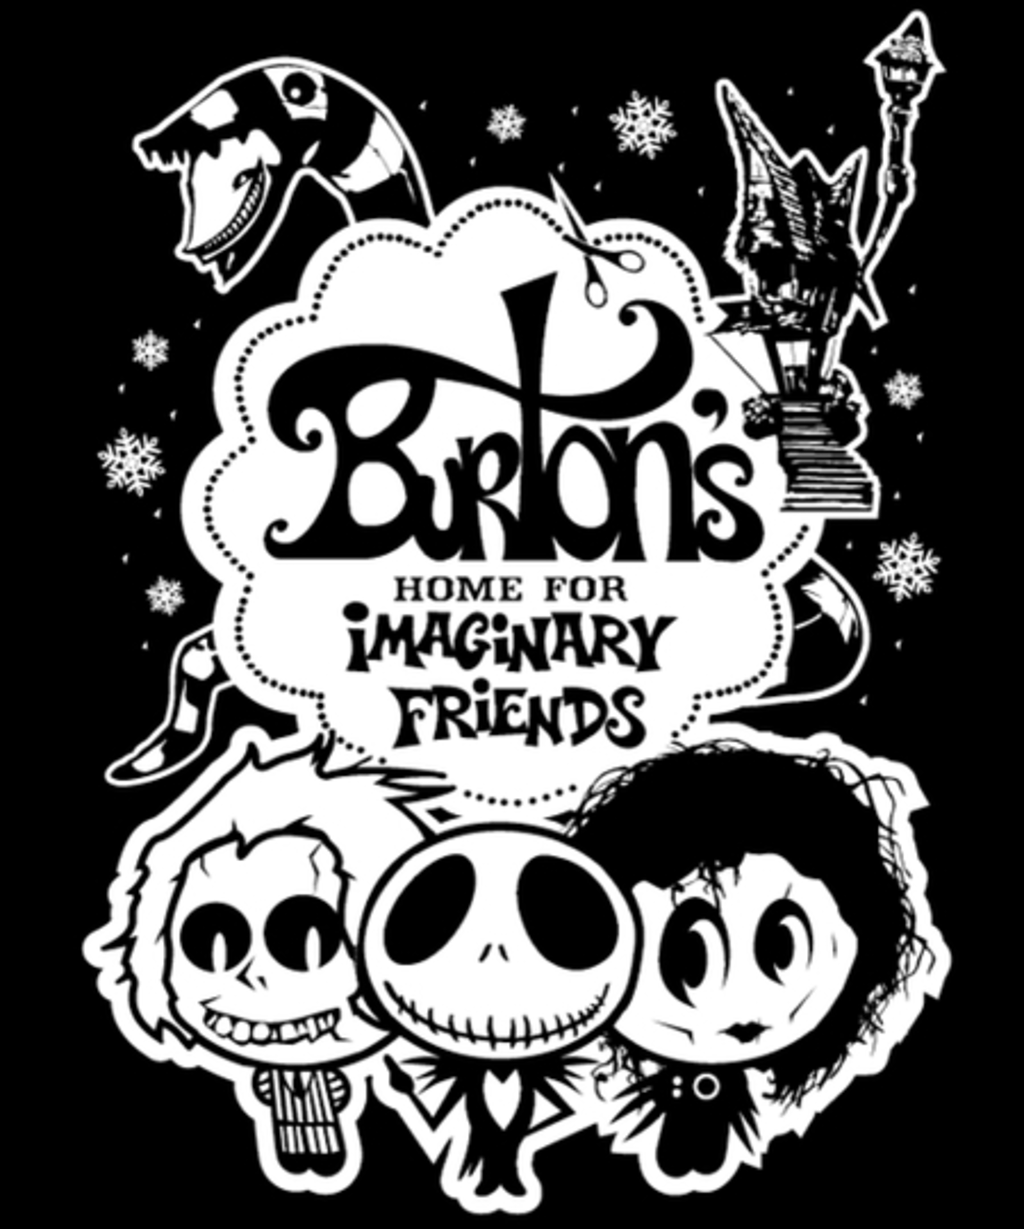 Qwertee: Burton's Home for Imaginary Friends